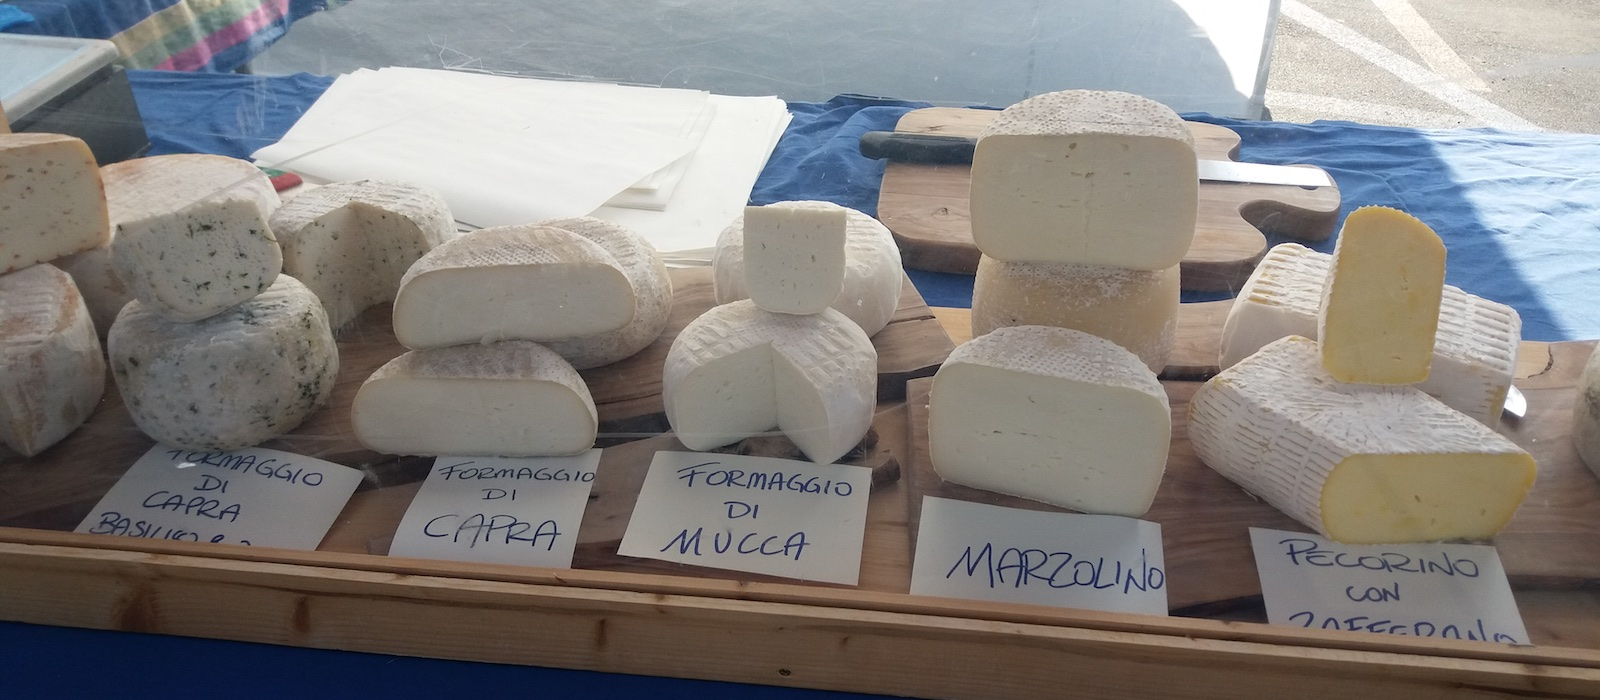 Formaggi artigianali Toscani